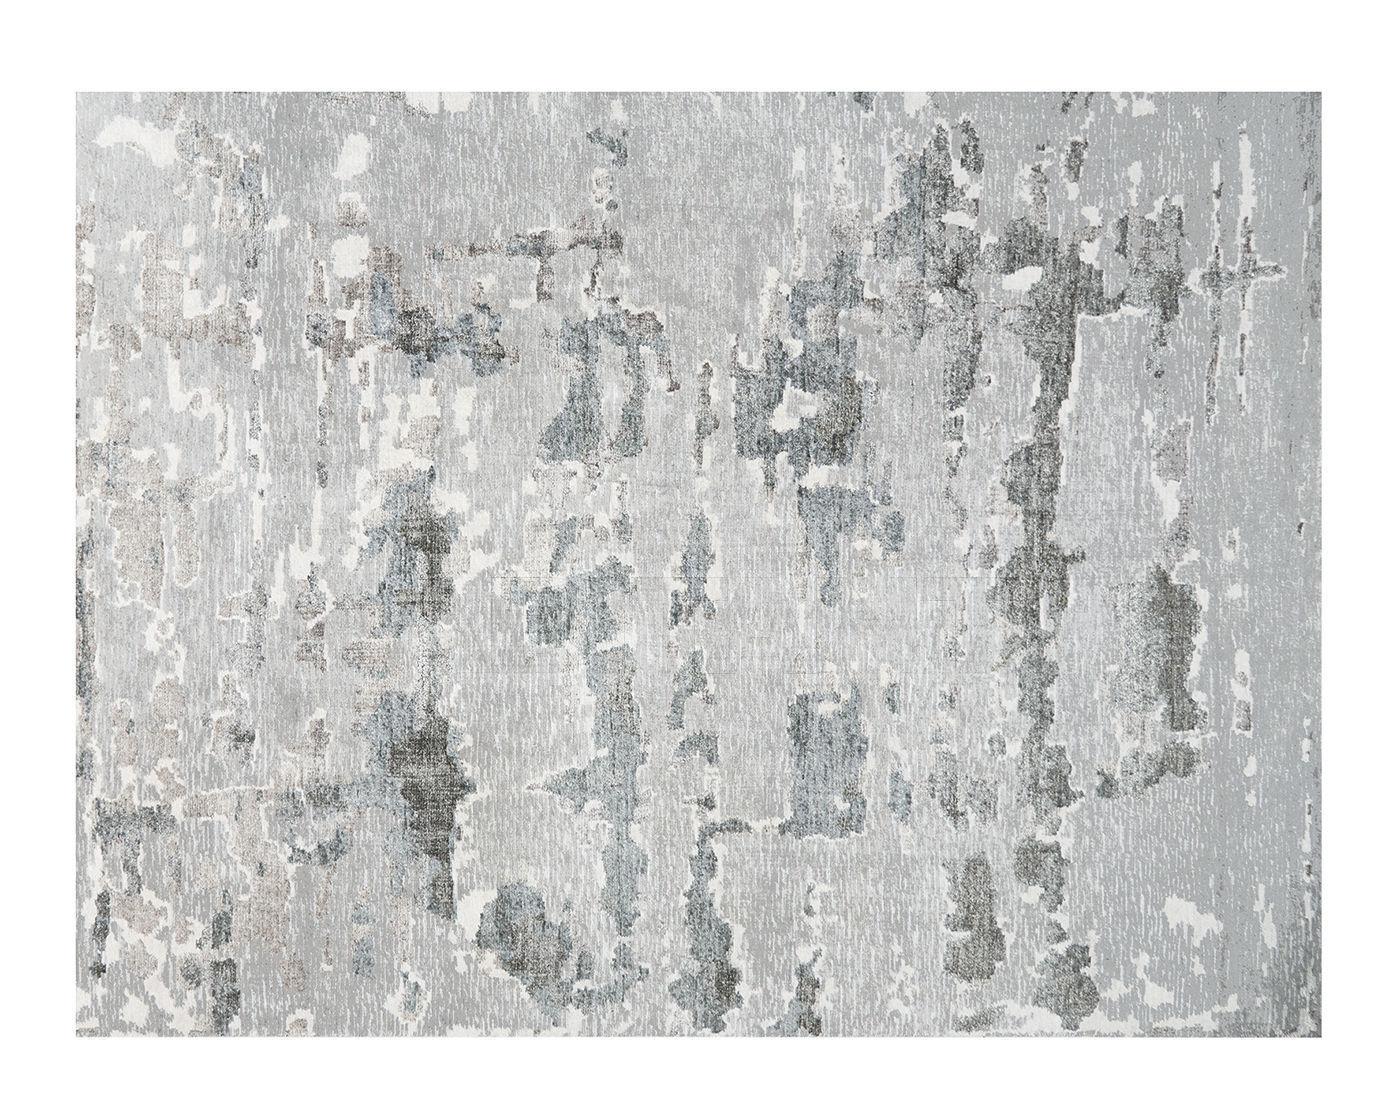 Buy Modern carpet AQUARELLE Christopher Guy 2019 47-0039-A-Mocha/Chic Grey